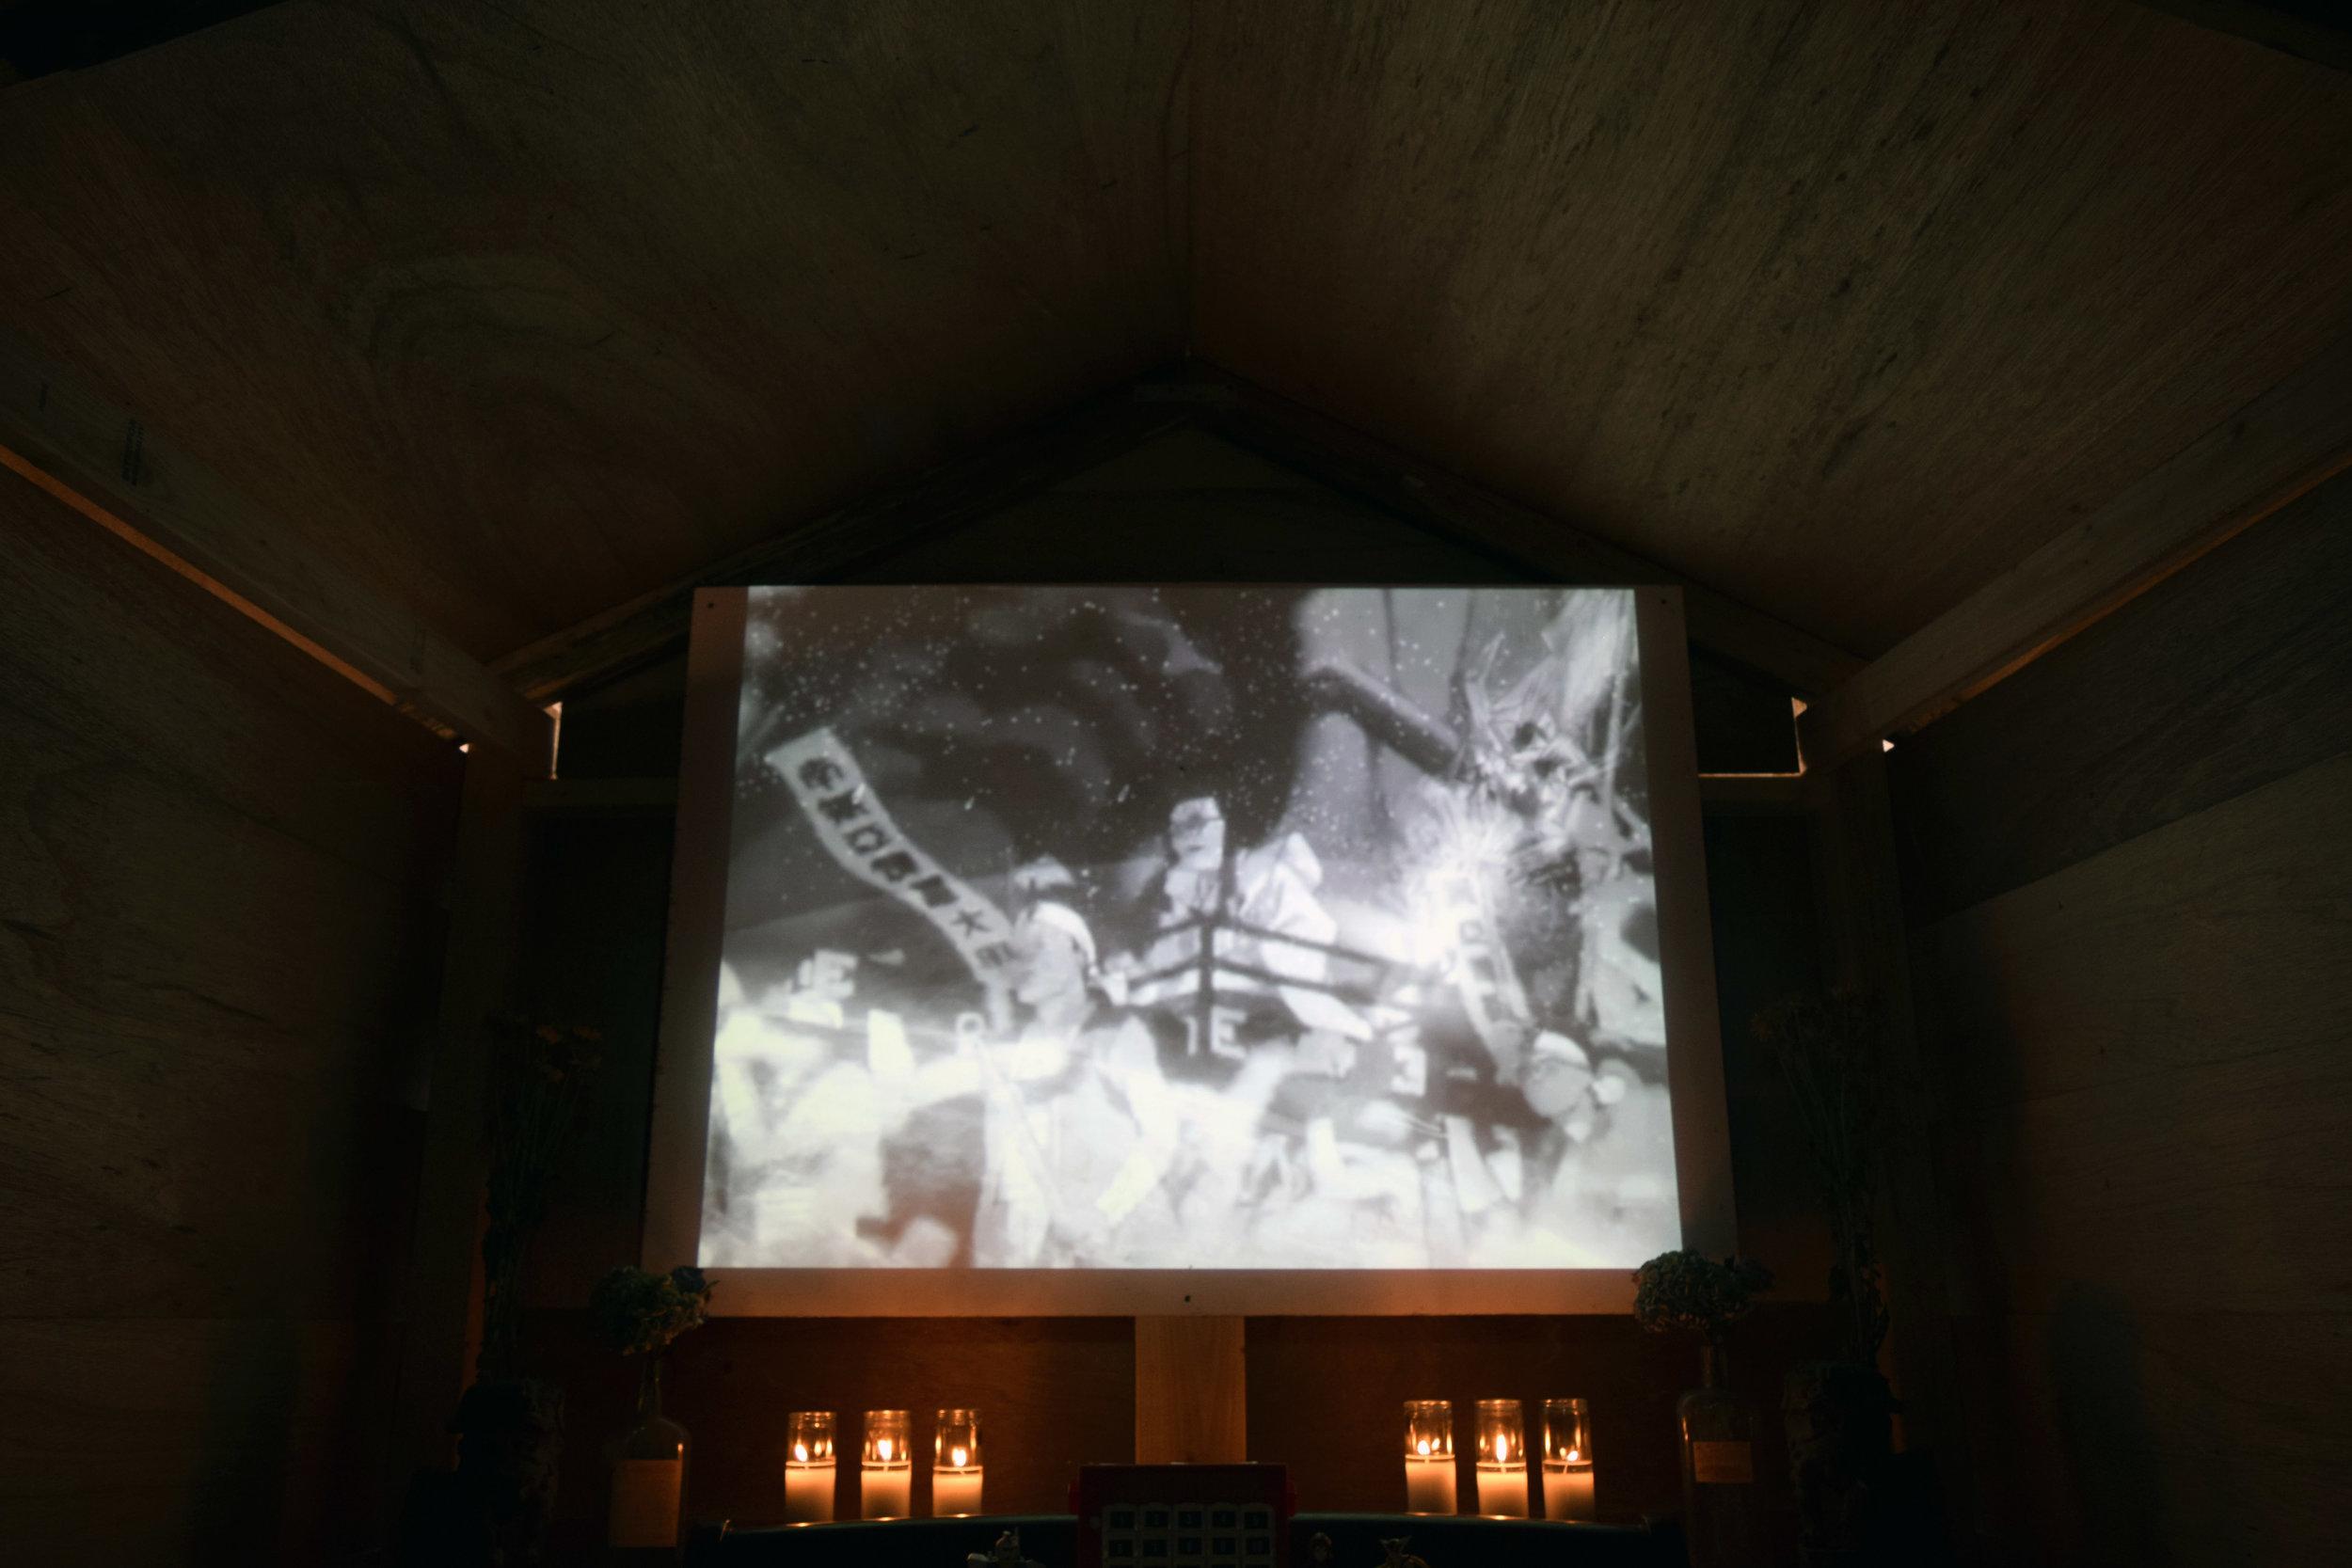 Video Plea for Peace by Andrew Kline